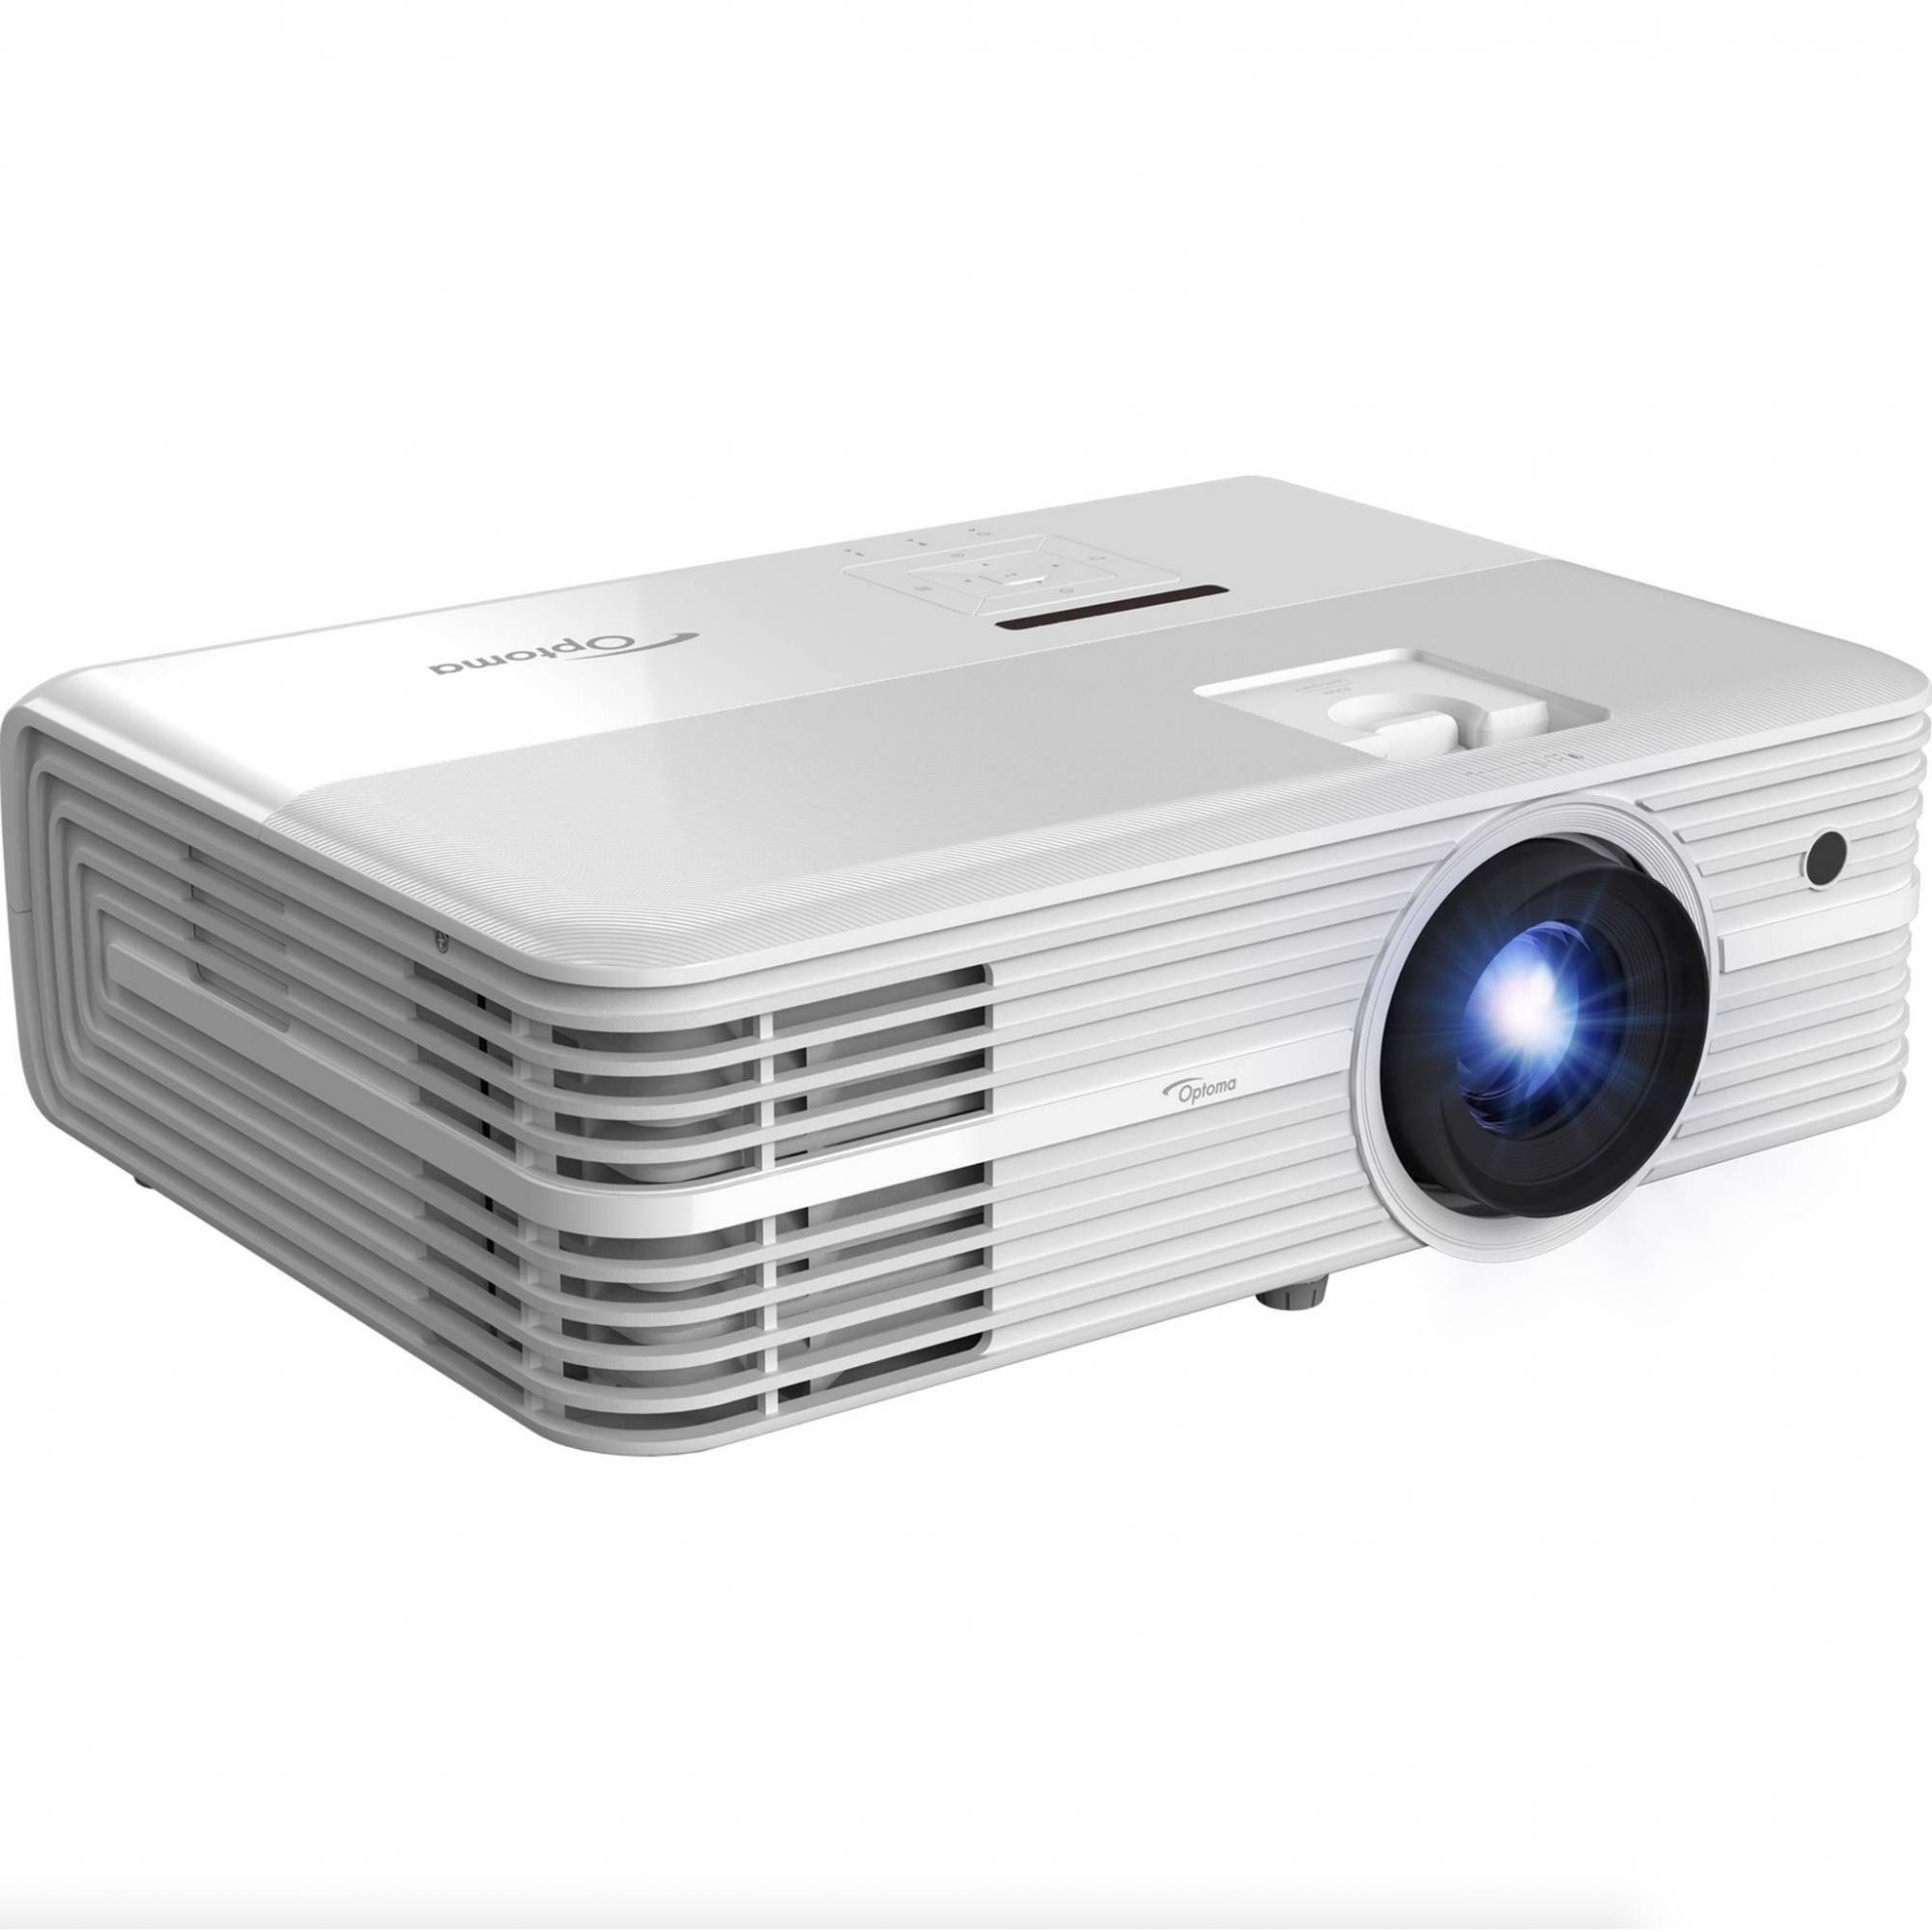 Projetor Optoma UHD52ALV 3500-Lumen HDR XPR 4K UHD DLP